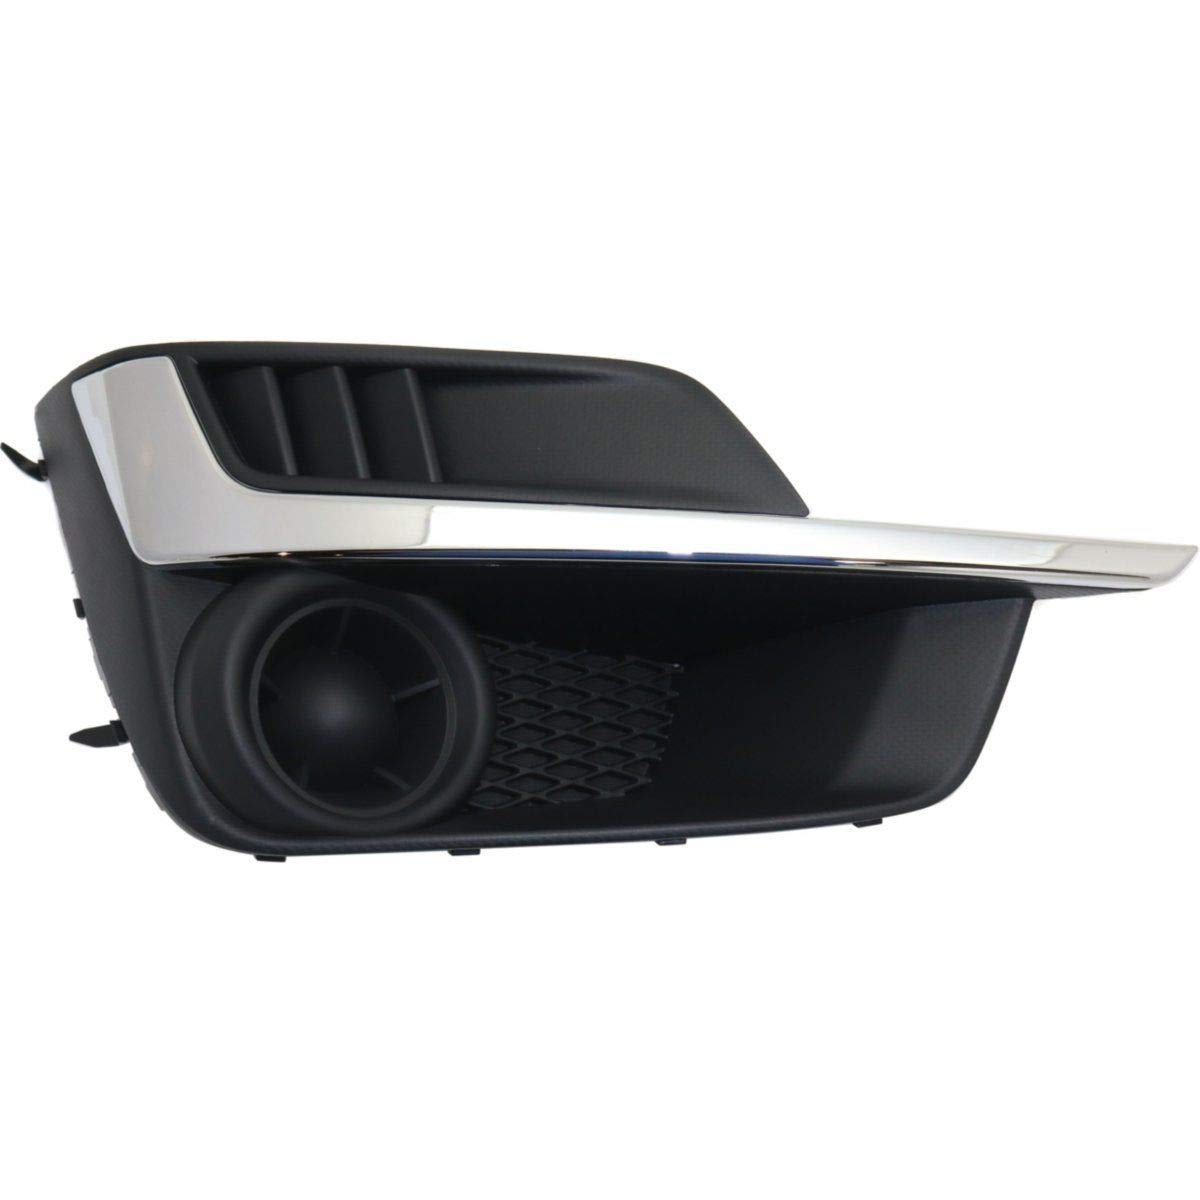 New Right Passenger Side Fog Lamp Cover For 2015-2016 Subaru Impreza With Chrome Molding Sedan Wagon SU1039109 57731FJ400